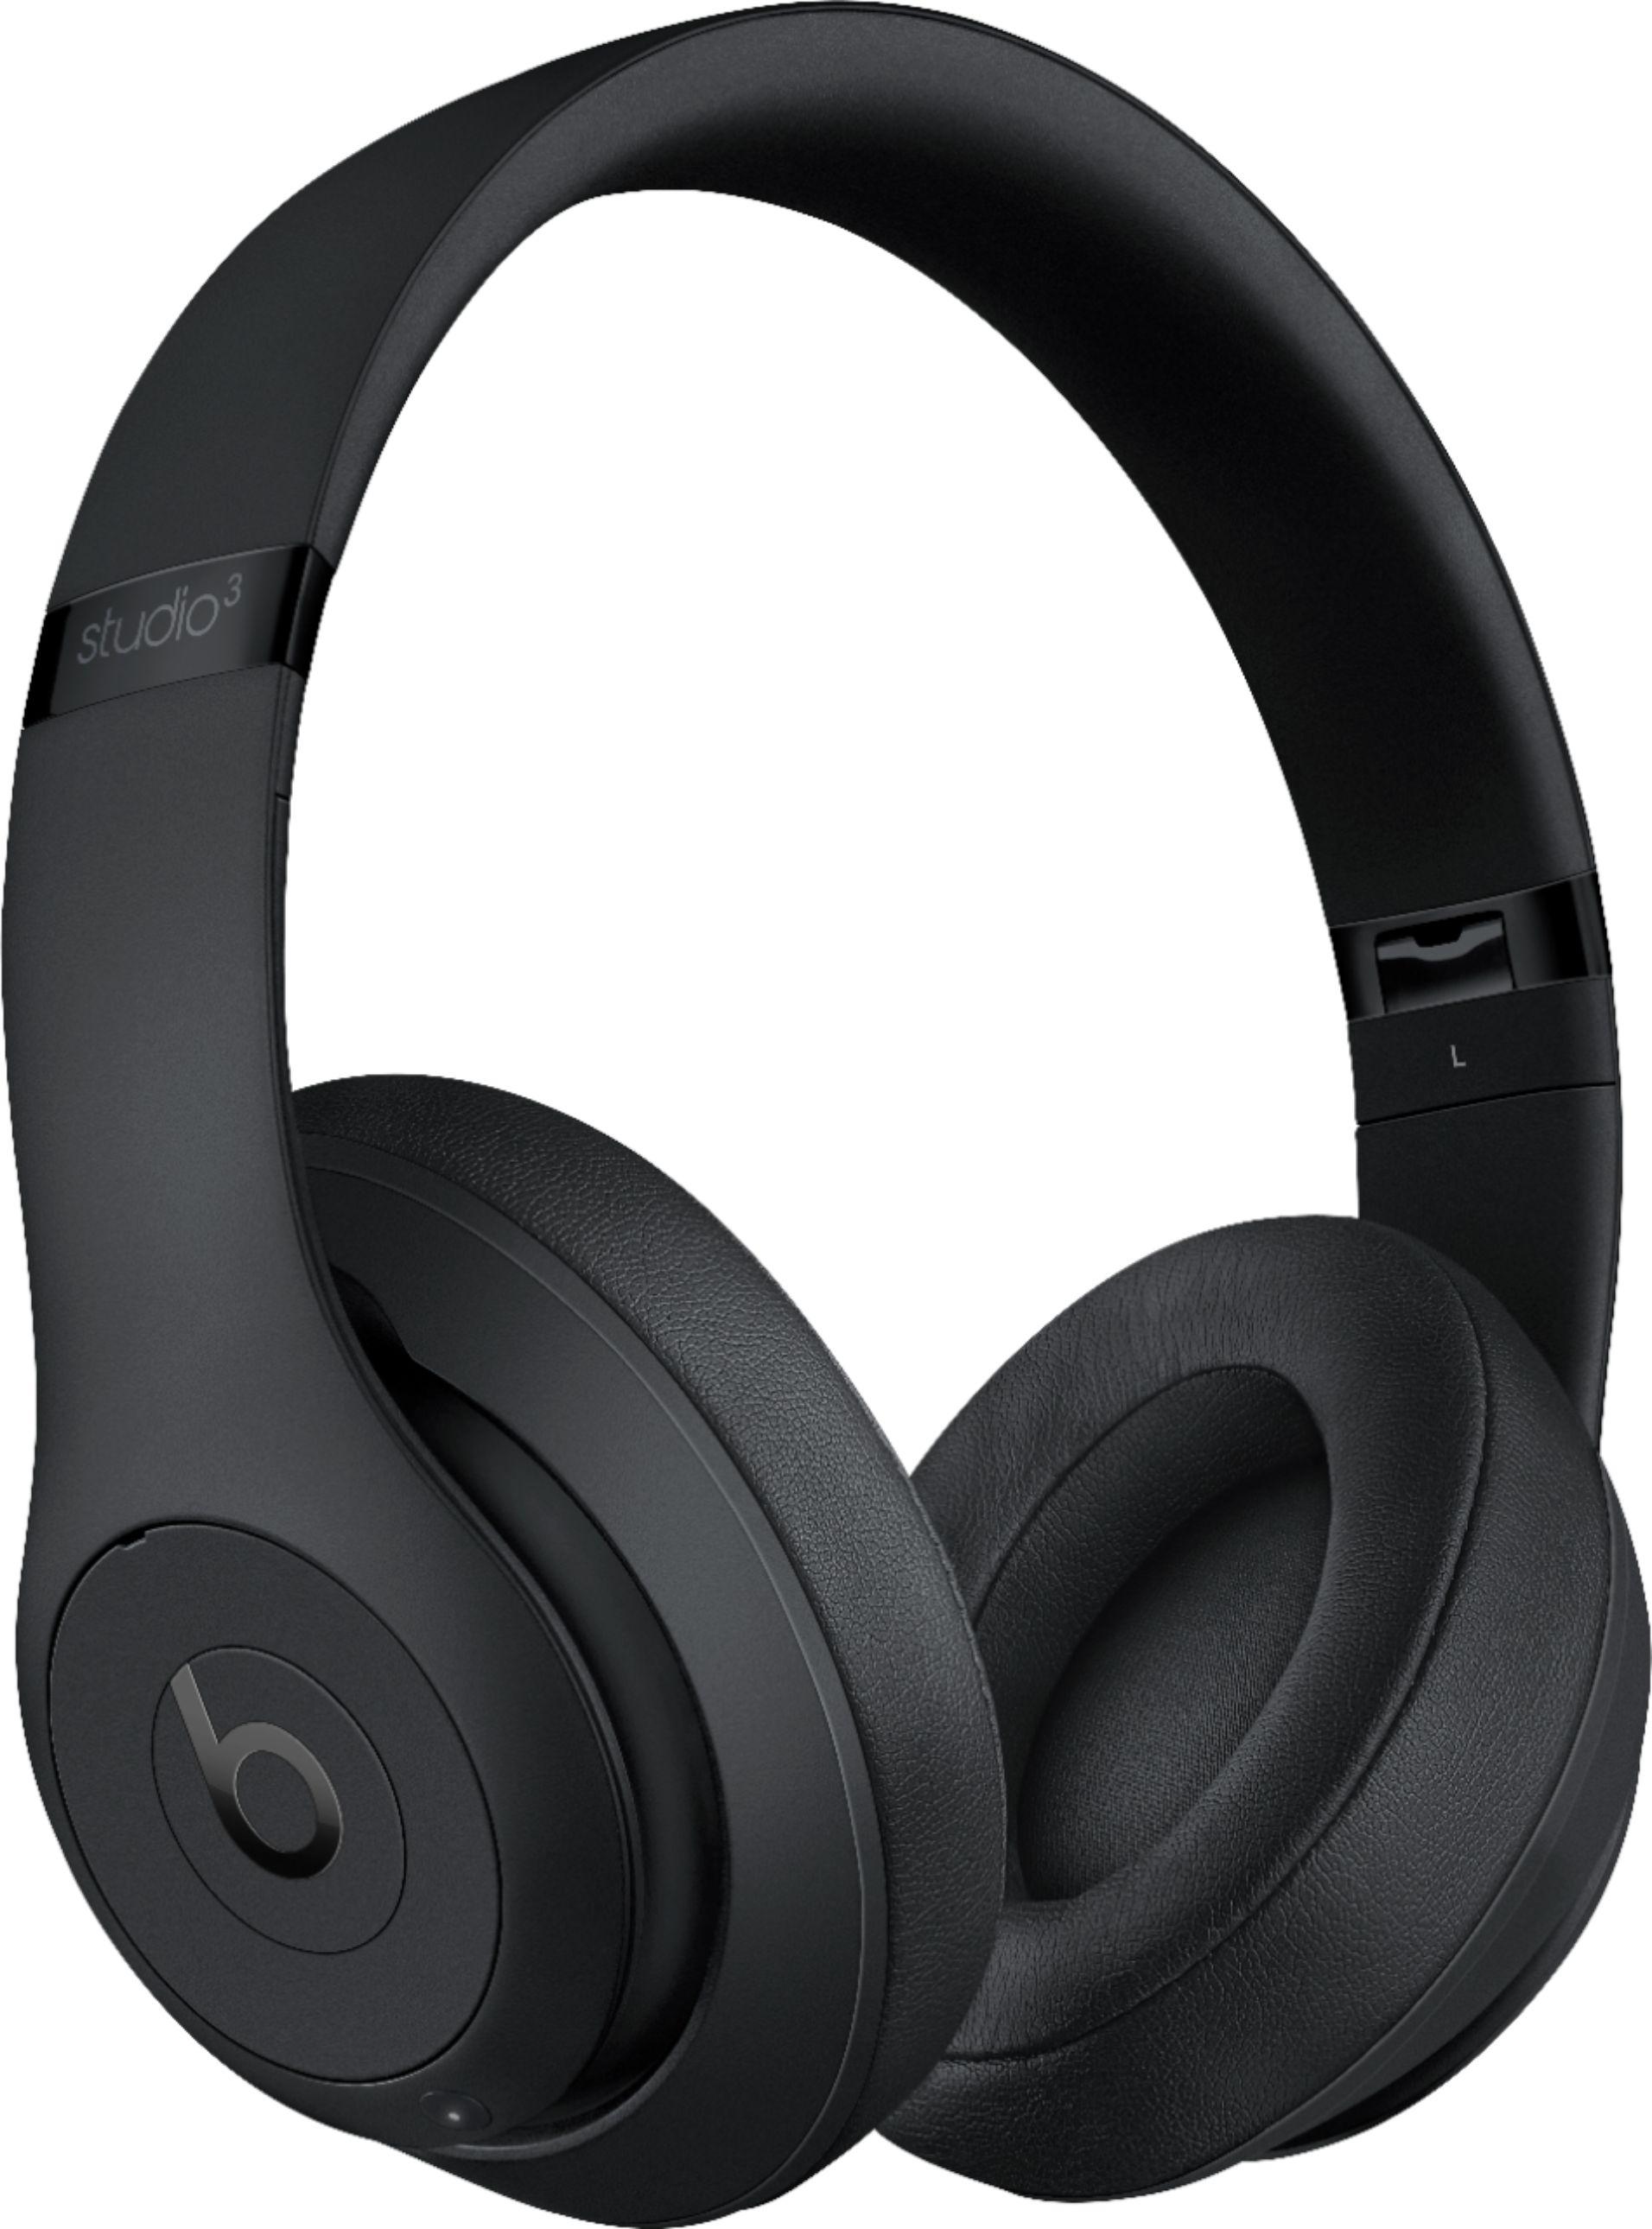 Beats Studio3 Wireless Bluetooth Headphones (Matte Black) $199